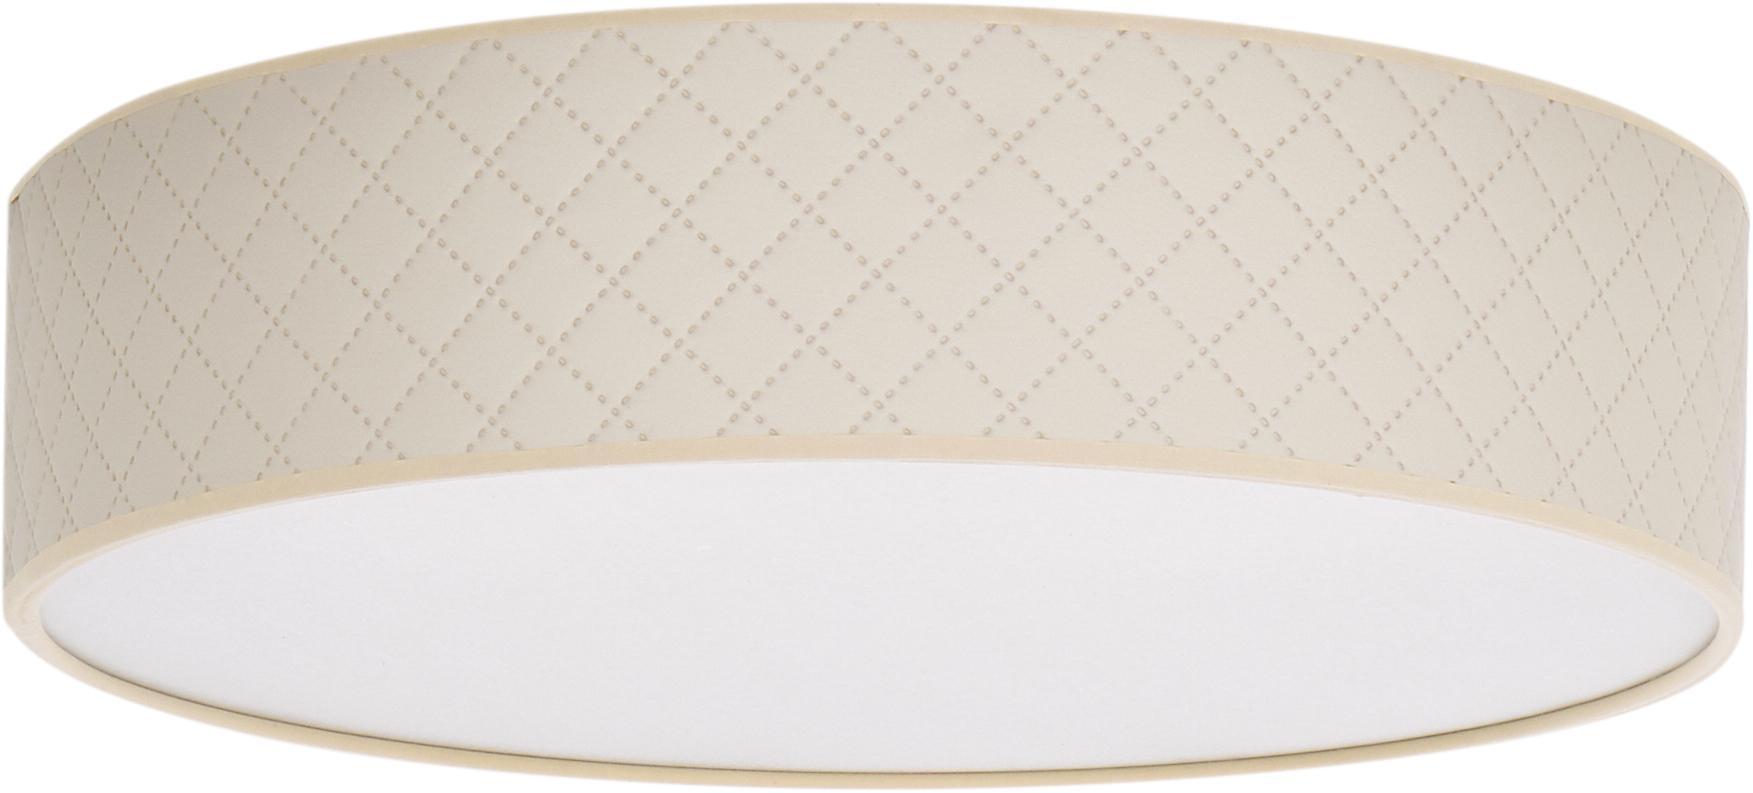 Plafondlamp Trece uit leer, Lampenkap: leer, Diffuser: papier, Crèmekleurig, Ø 40 x H 11 cm